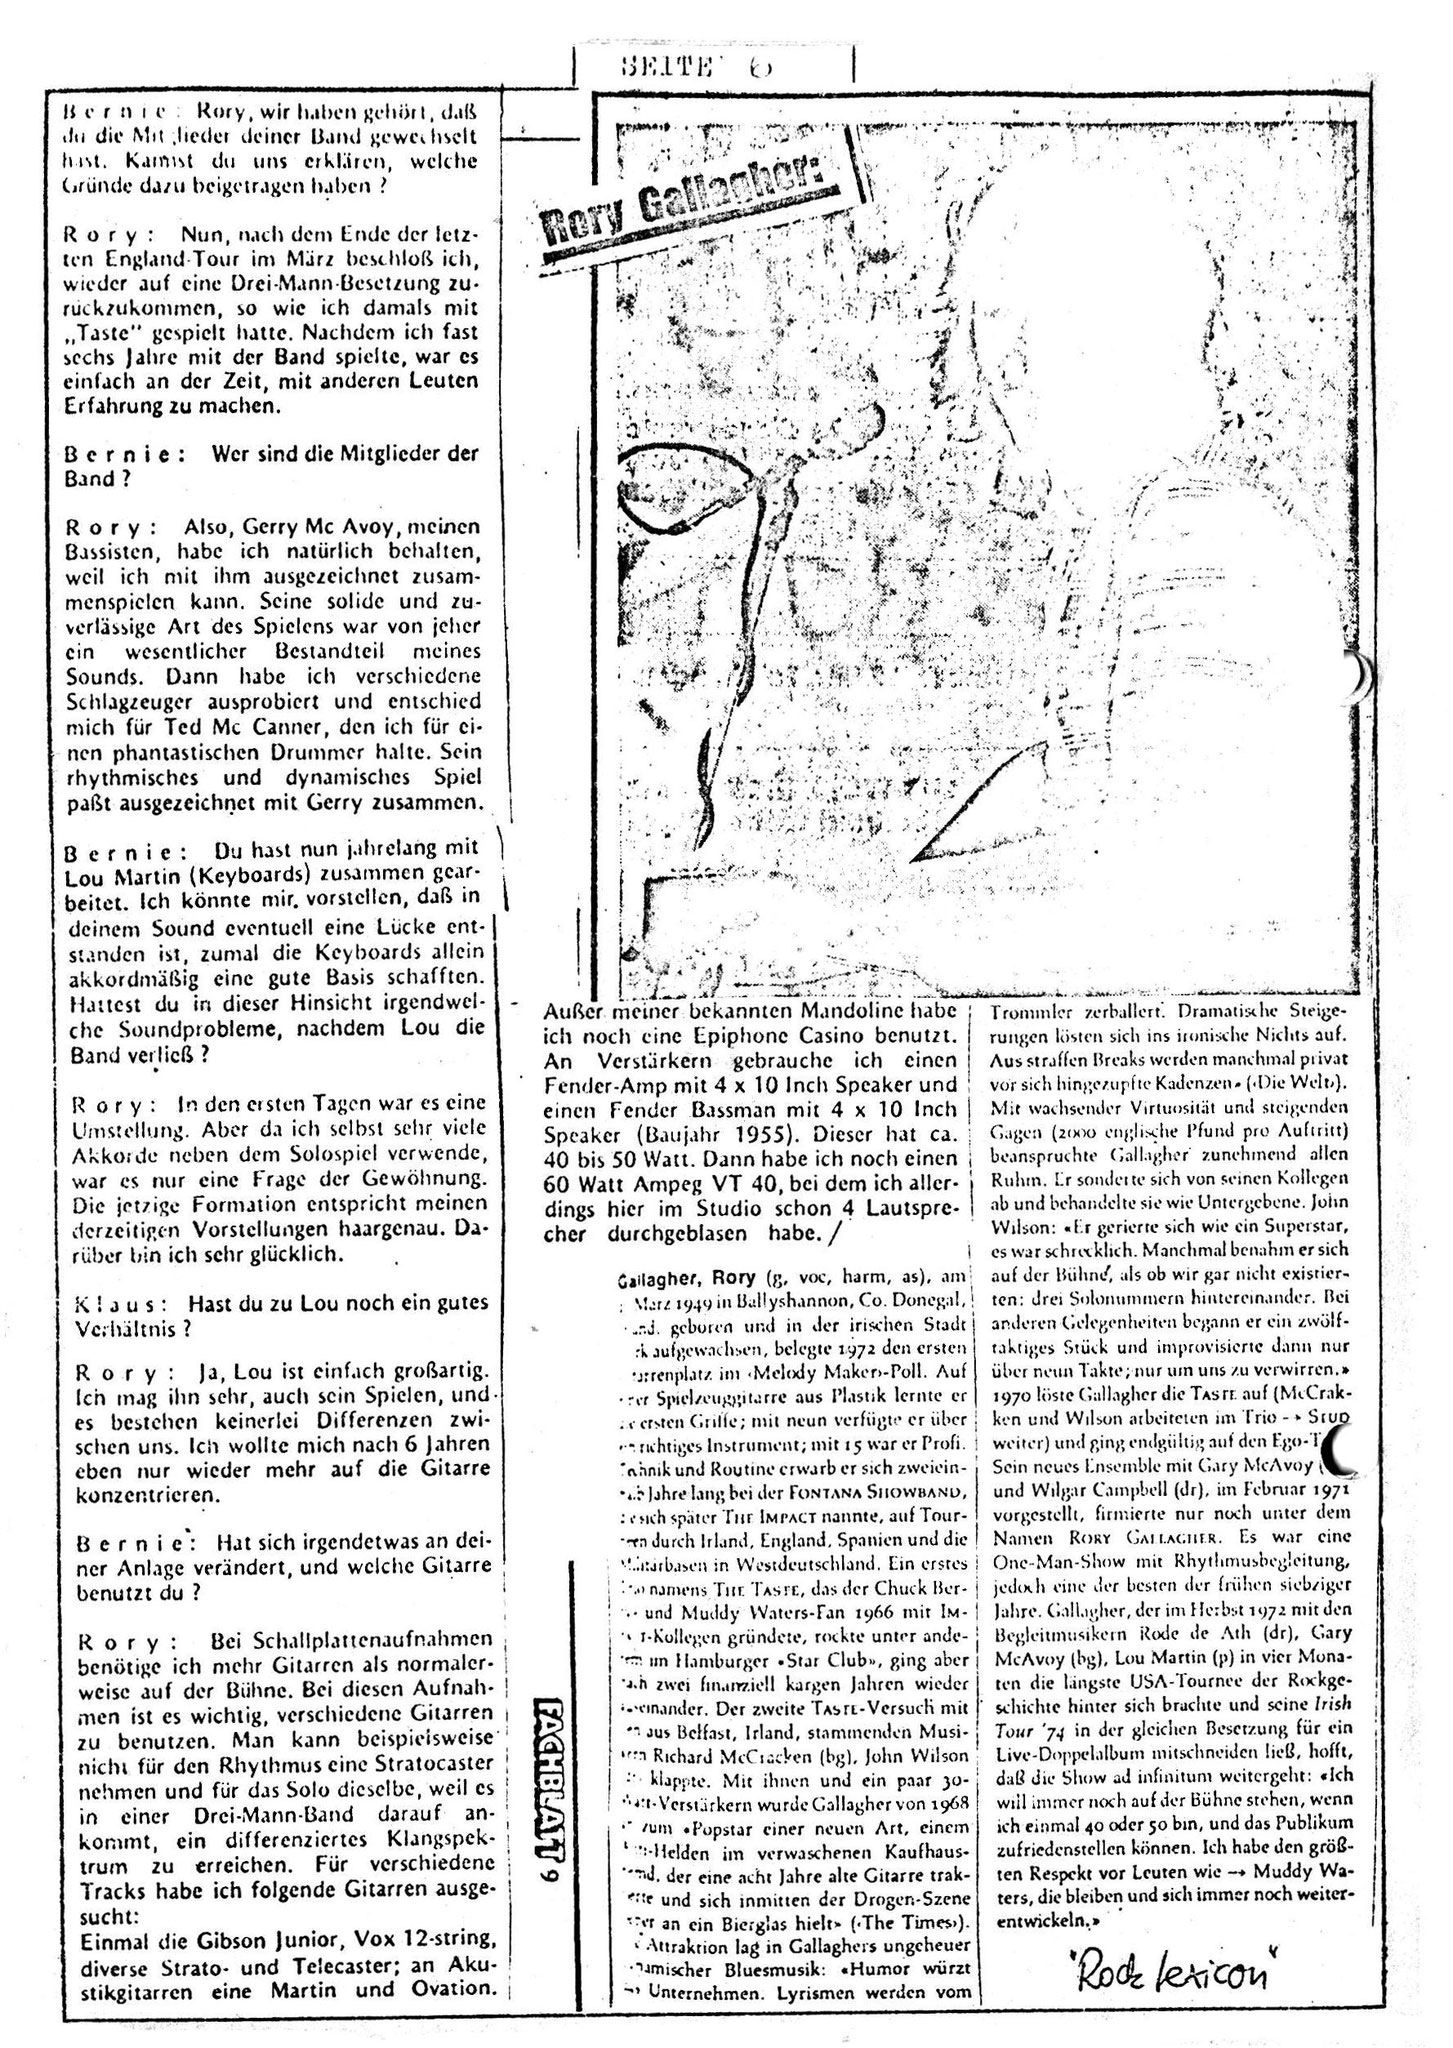 Slaughterhouse - Ausgabe 0 - Seite 6